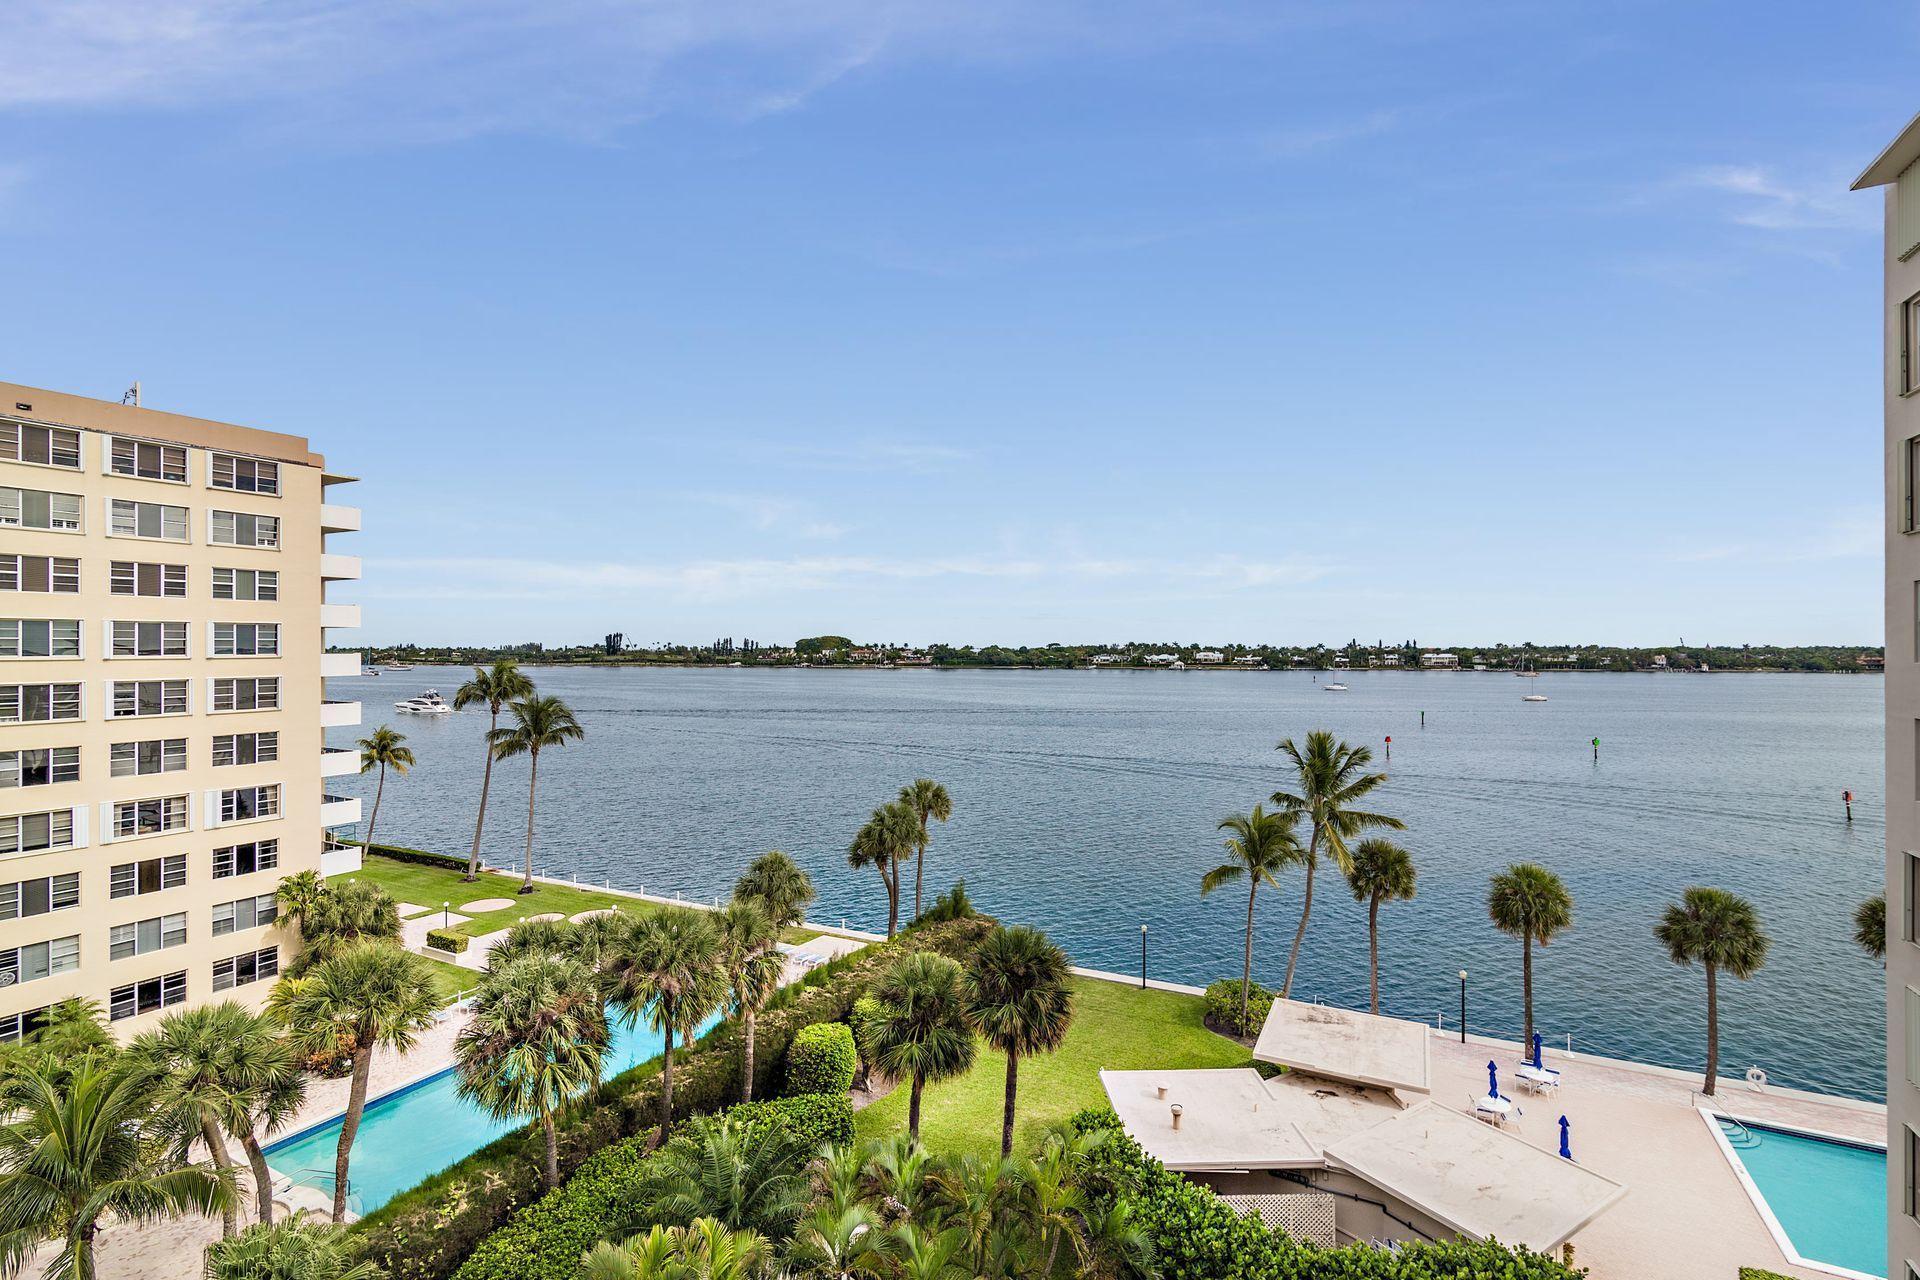 2600 Flagler Drive, West Palm Beach, Florida 33407, 2 Bedrooms Bedrooms, ,2 BathroomsBathrooms,Residential,For Sale,Flagler,RX-10583989